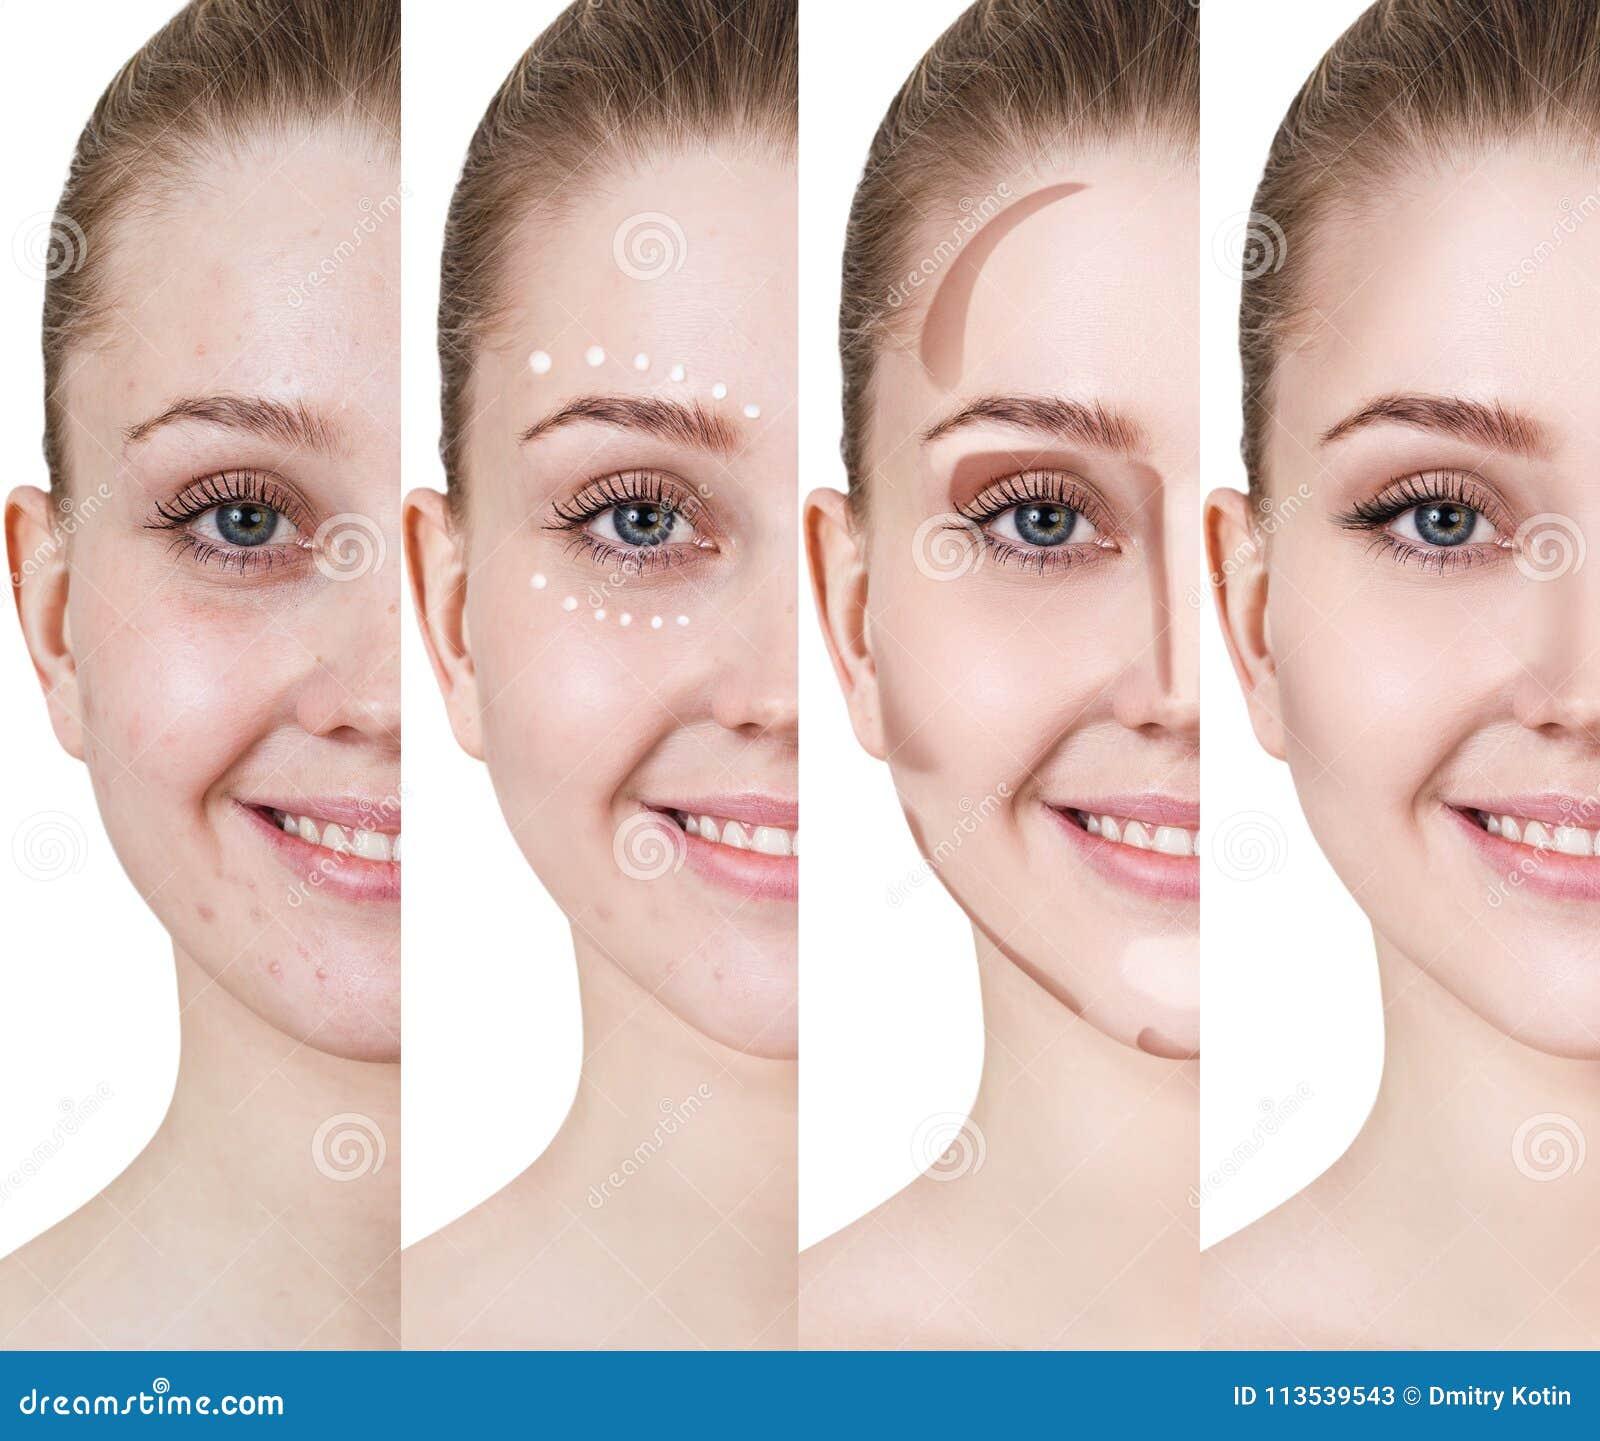 Woman Applying Makeup By Steps Stock Image Image Of Closeup Massaging 113539543